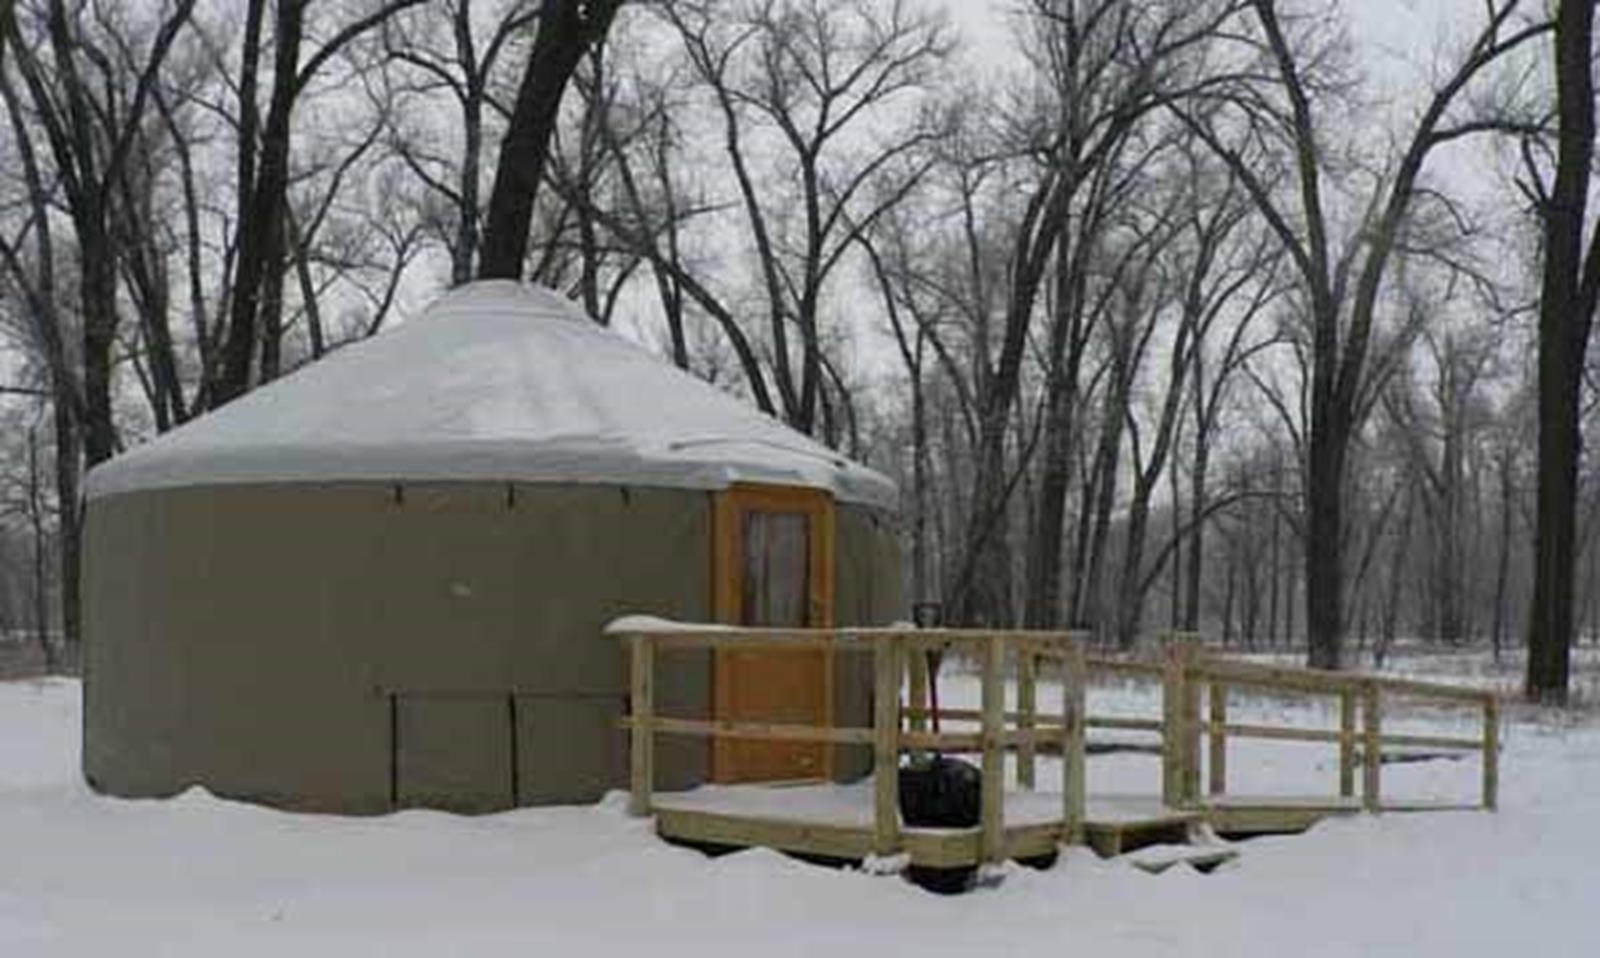 Primitive camping yurt, Cross Ranch State Park. Credit: ND Parks & Rec.